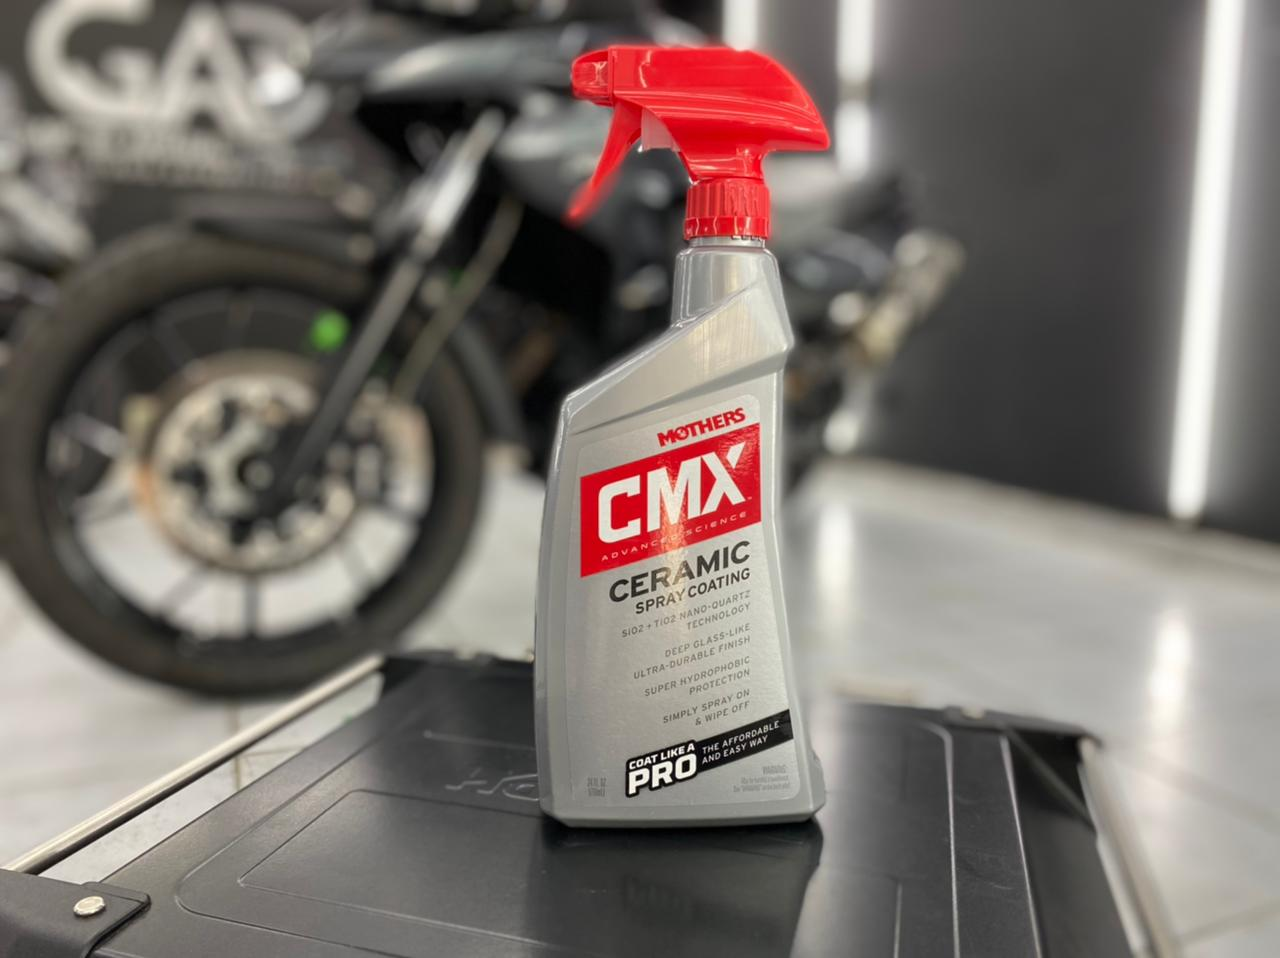 CMX ceramic spray coating 710ml - Mothers